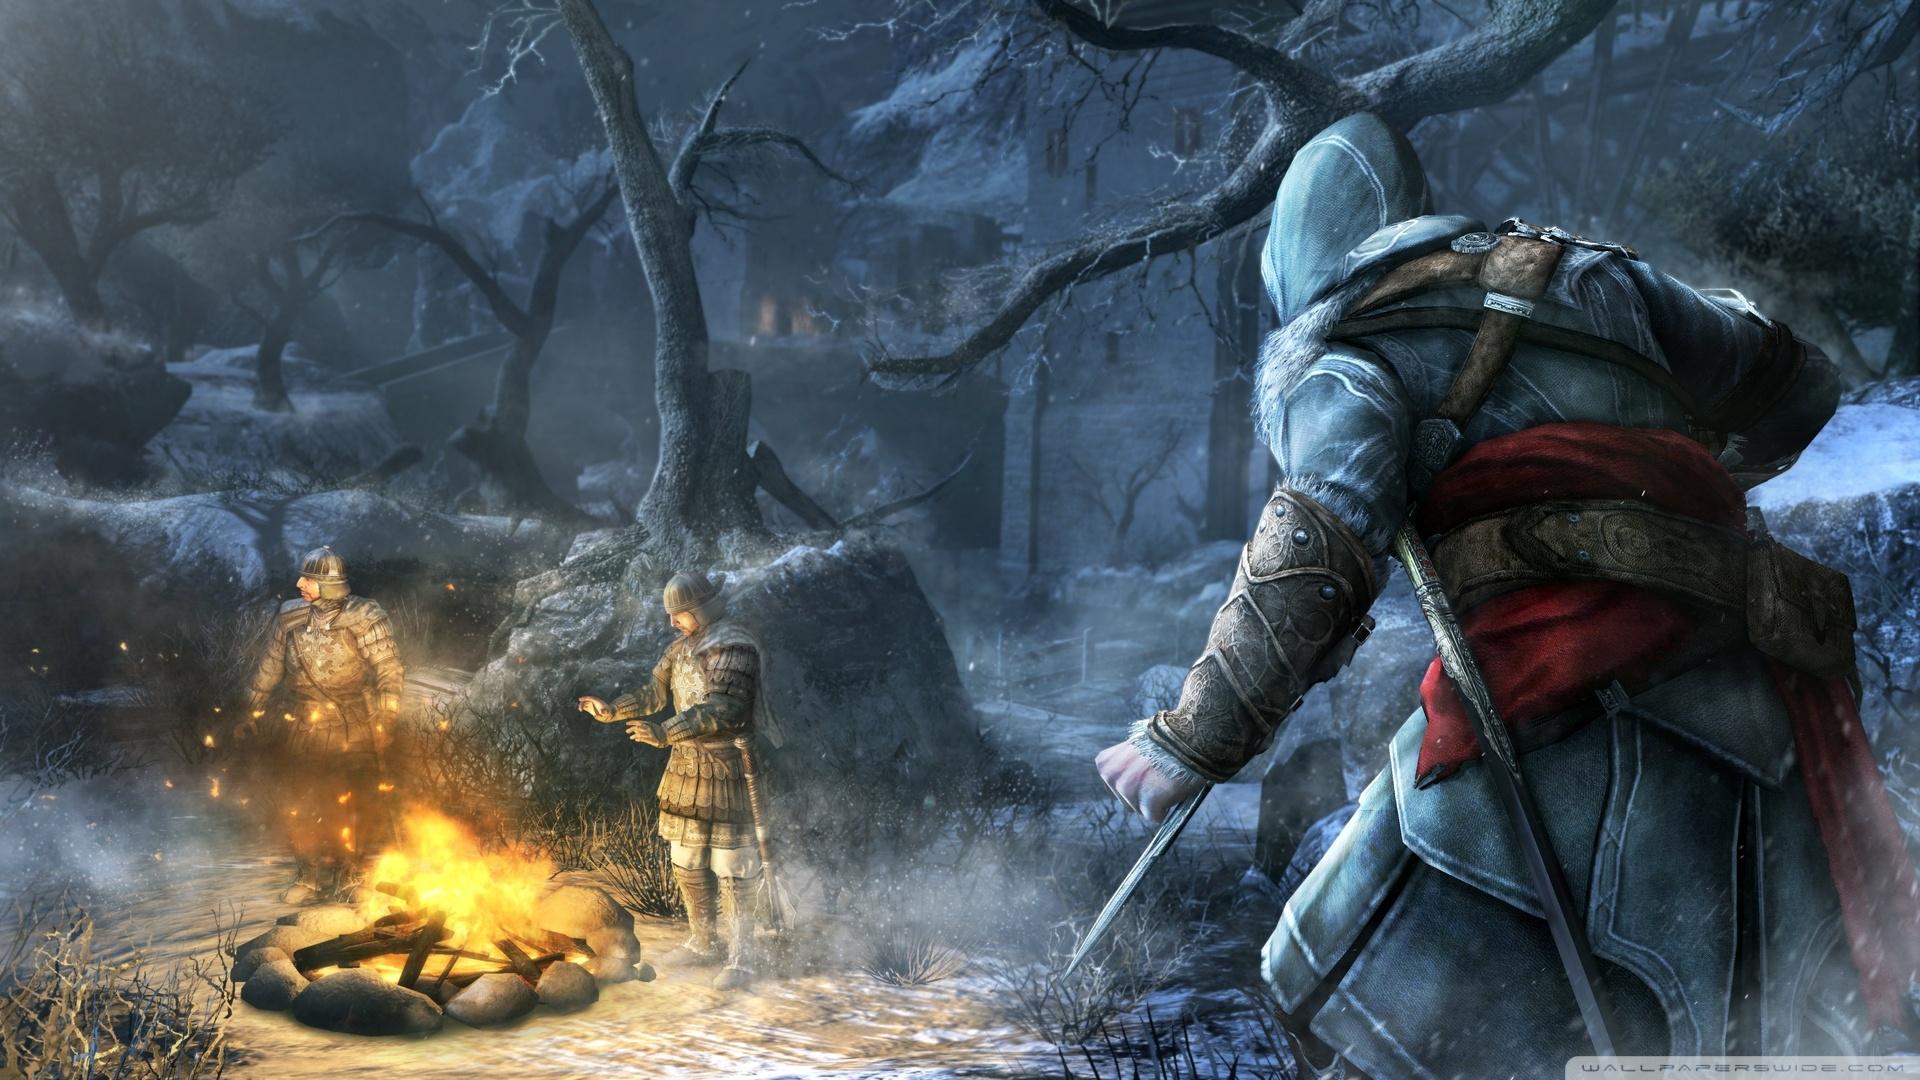 Assassins Creed Revelations wallpaper 149635 1920x1080